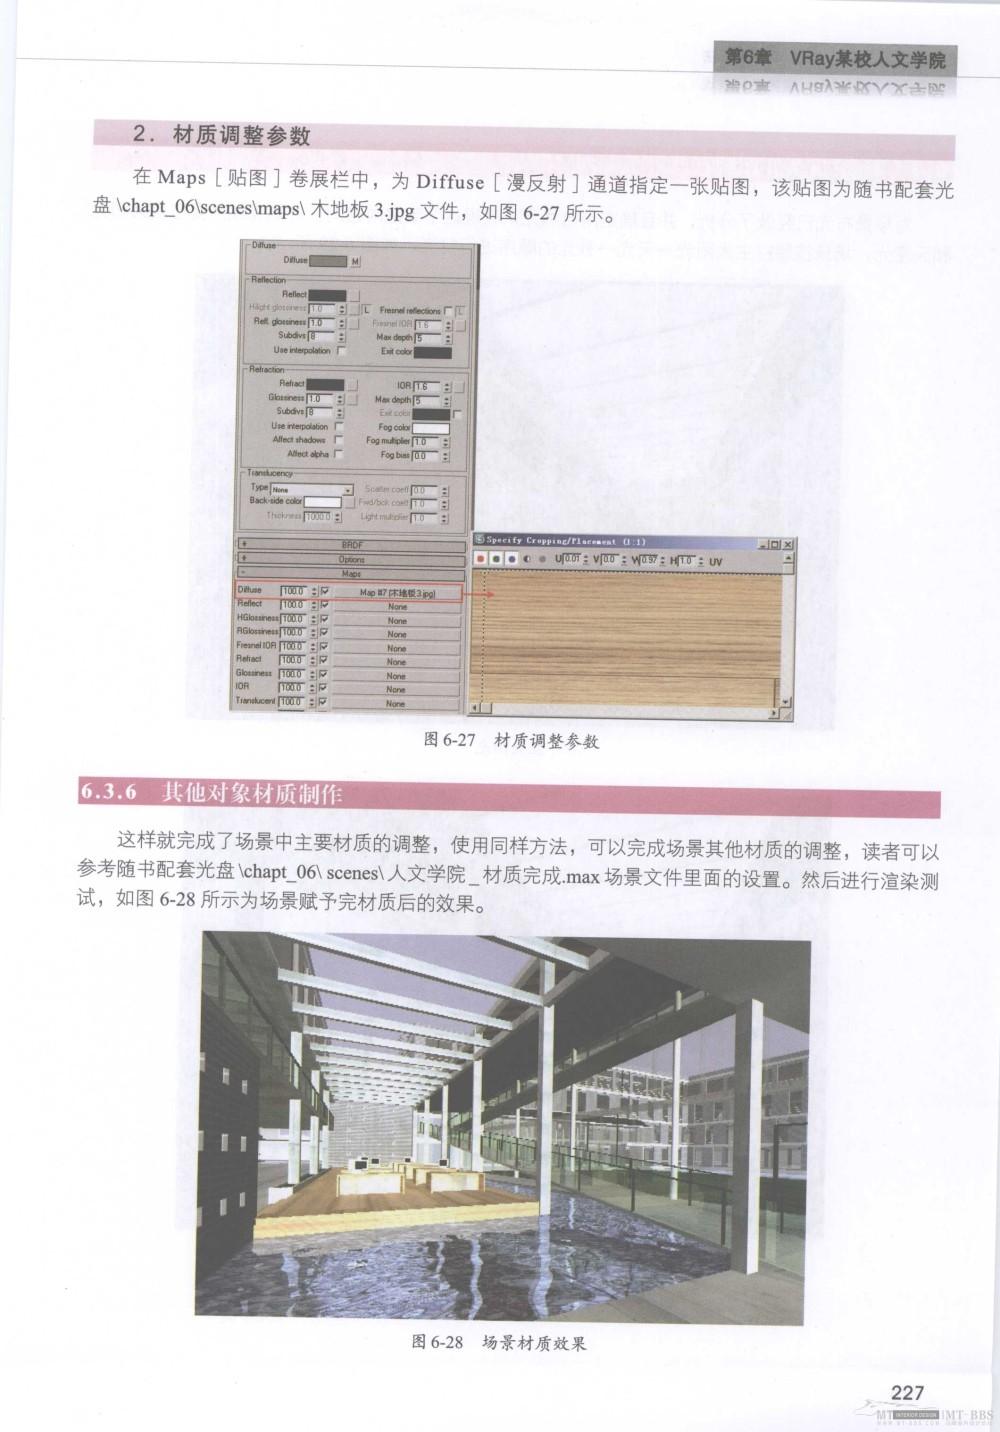 水晶石技法-3ds_Max&VRay室内空间表现_水晶石技法-3ds_Max&VRay室内空间表现_页面_233.jpg